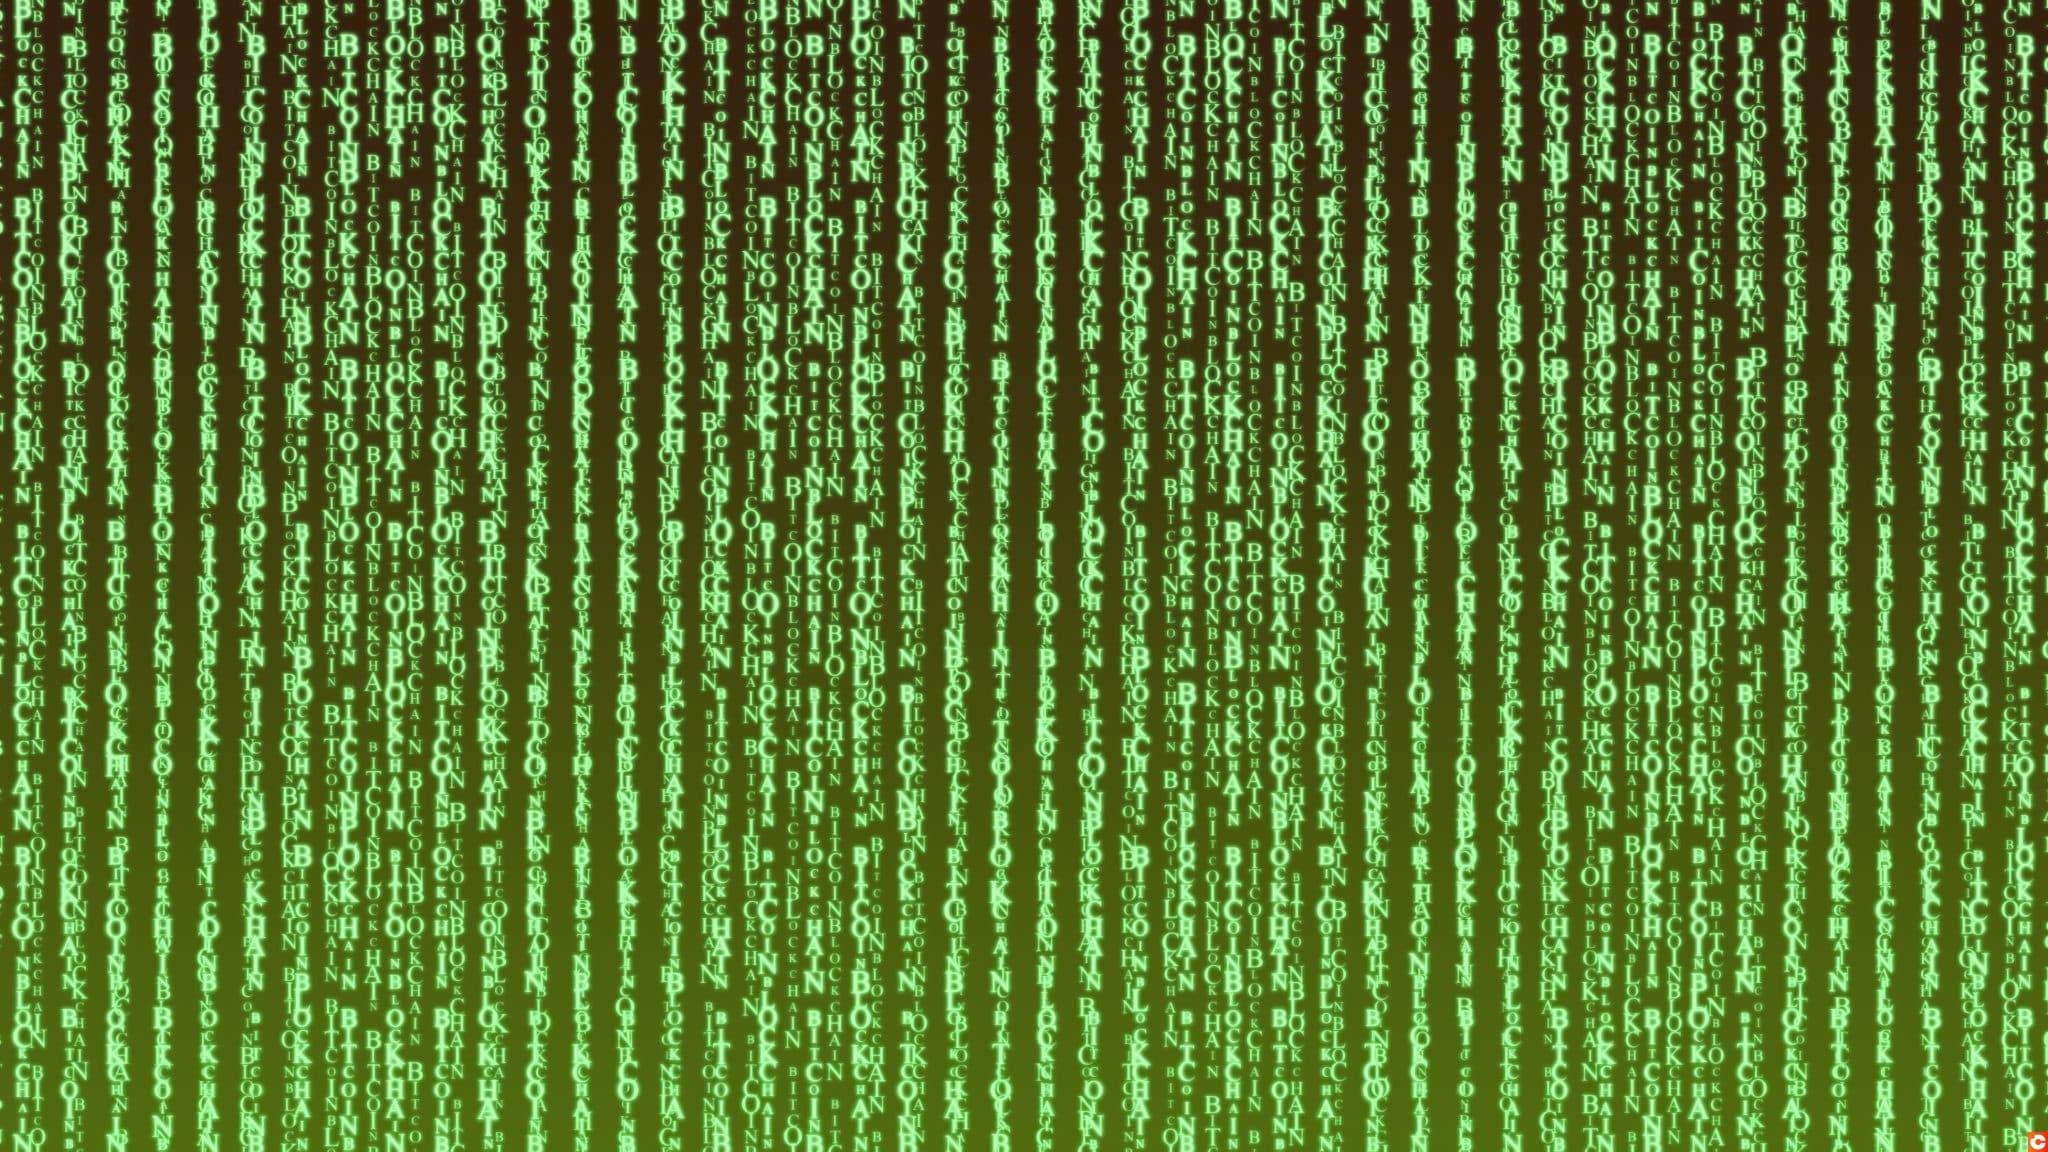 okb, okex, blockchain, cryptocurrency